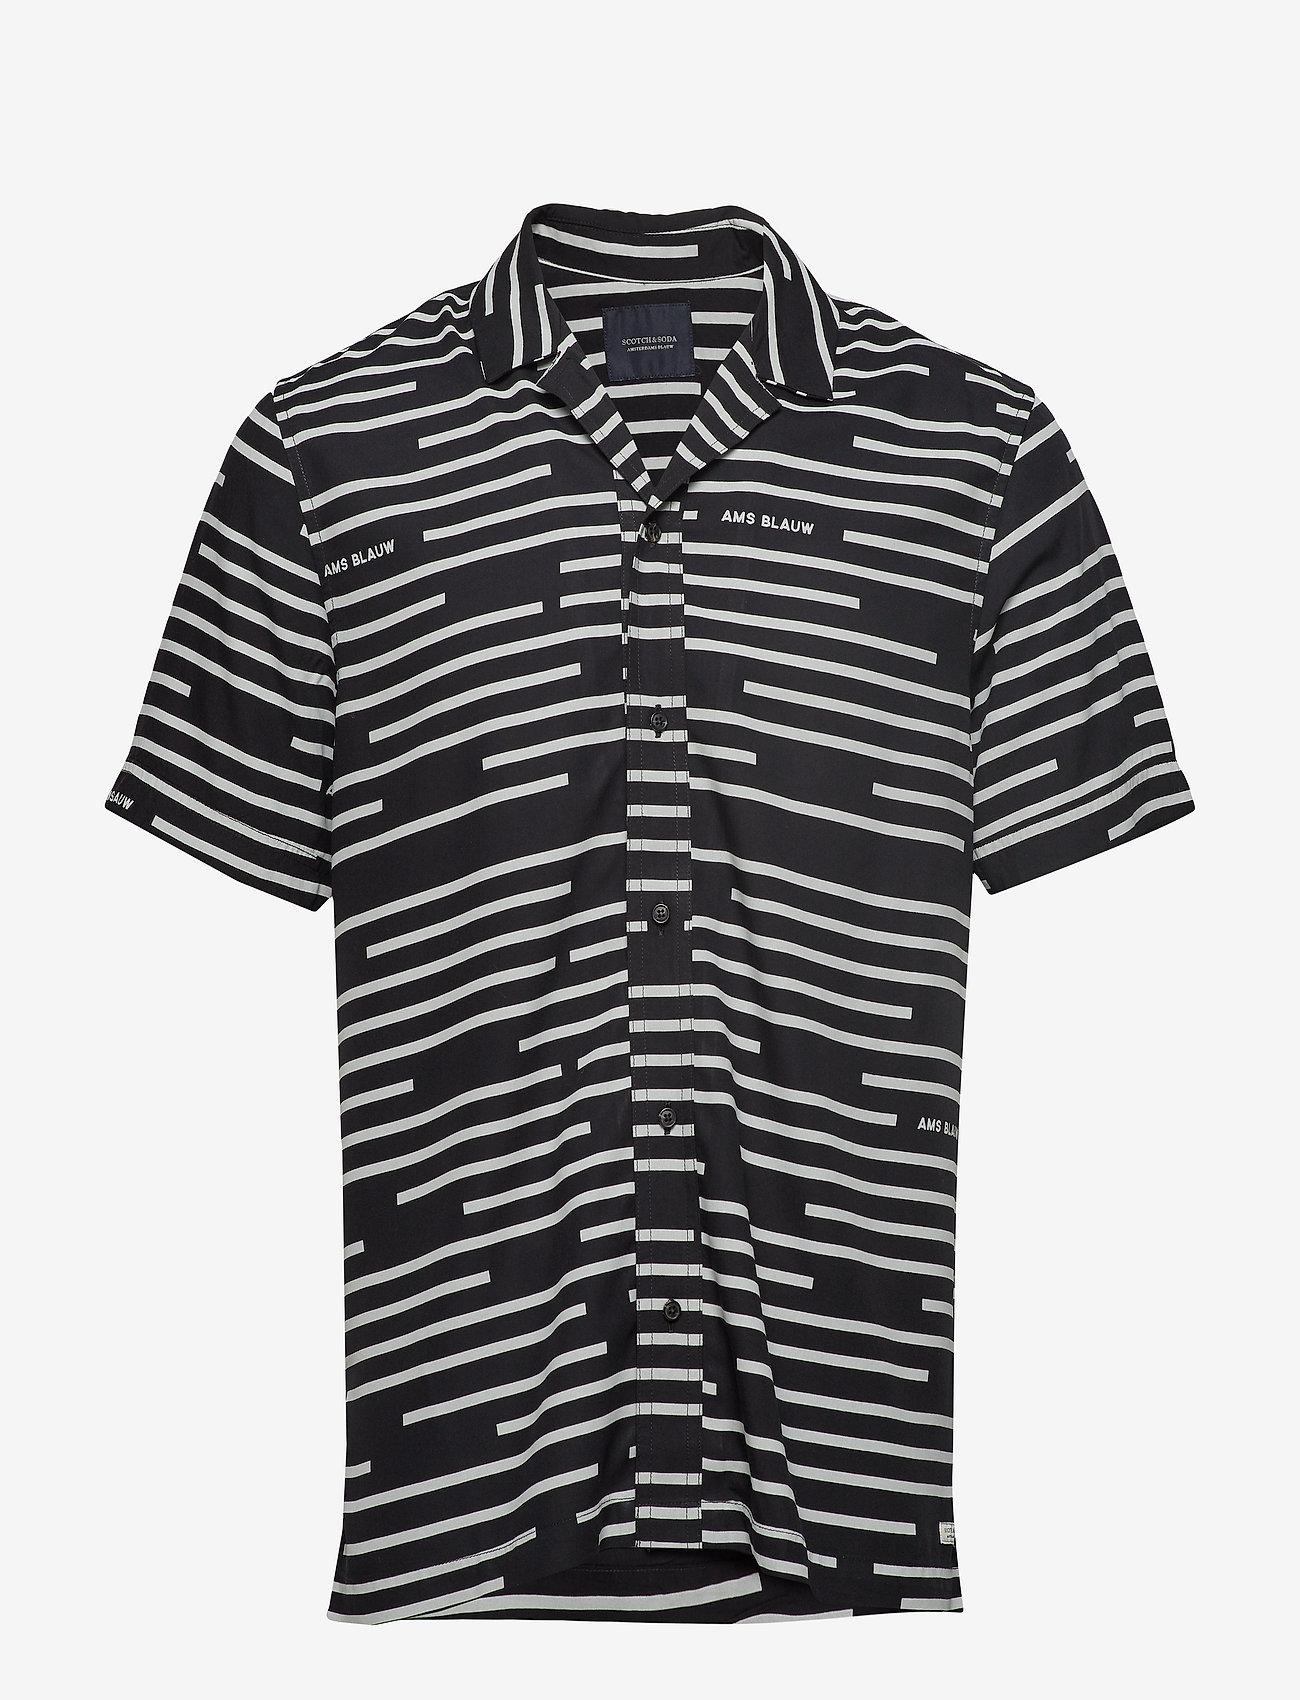 Scotch & Soda - Short sleeve shirt with prints - kortærmede skjorter - combo a - 0